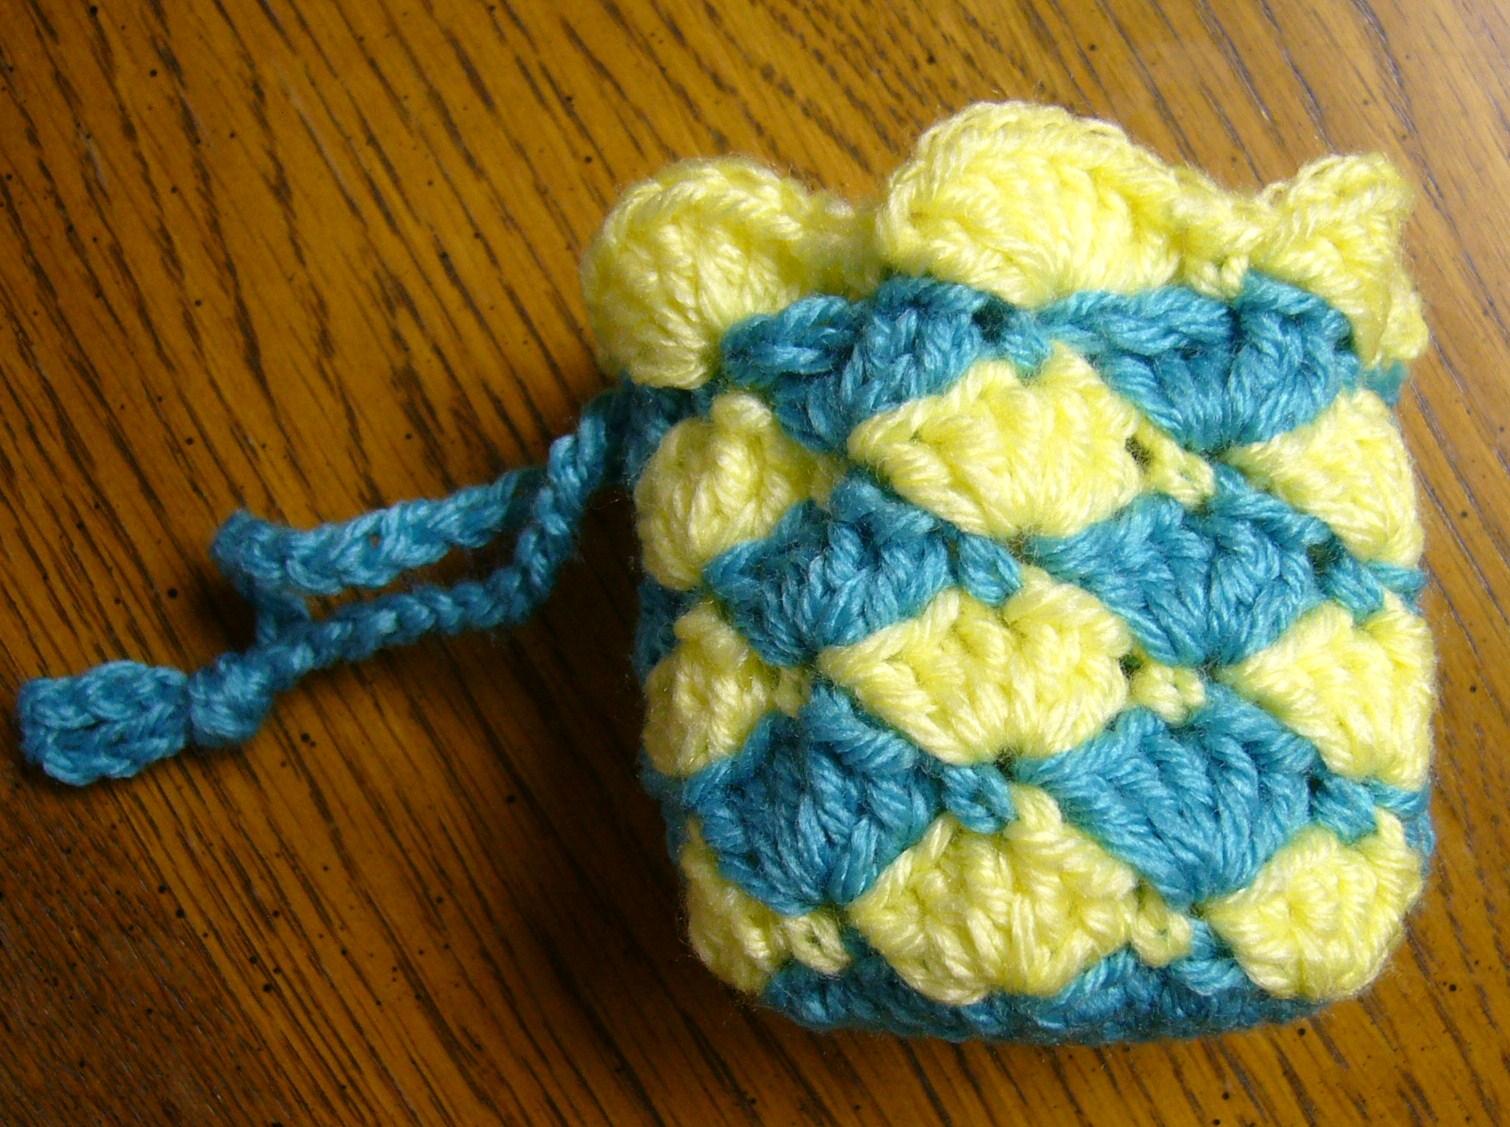 Crochet Change Purse Pattern : ... Shoe Boxes: Crochet Shell Pattern Coin (Change) Purse Instructions